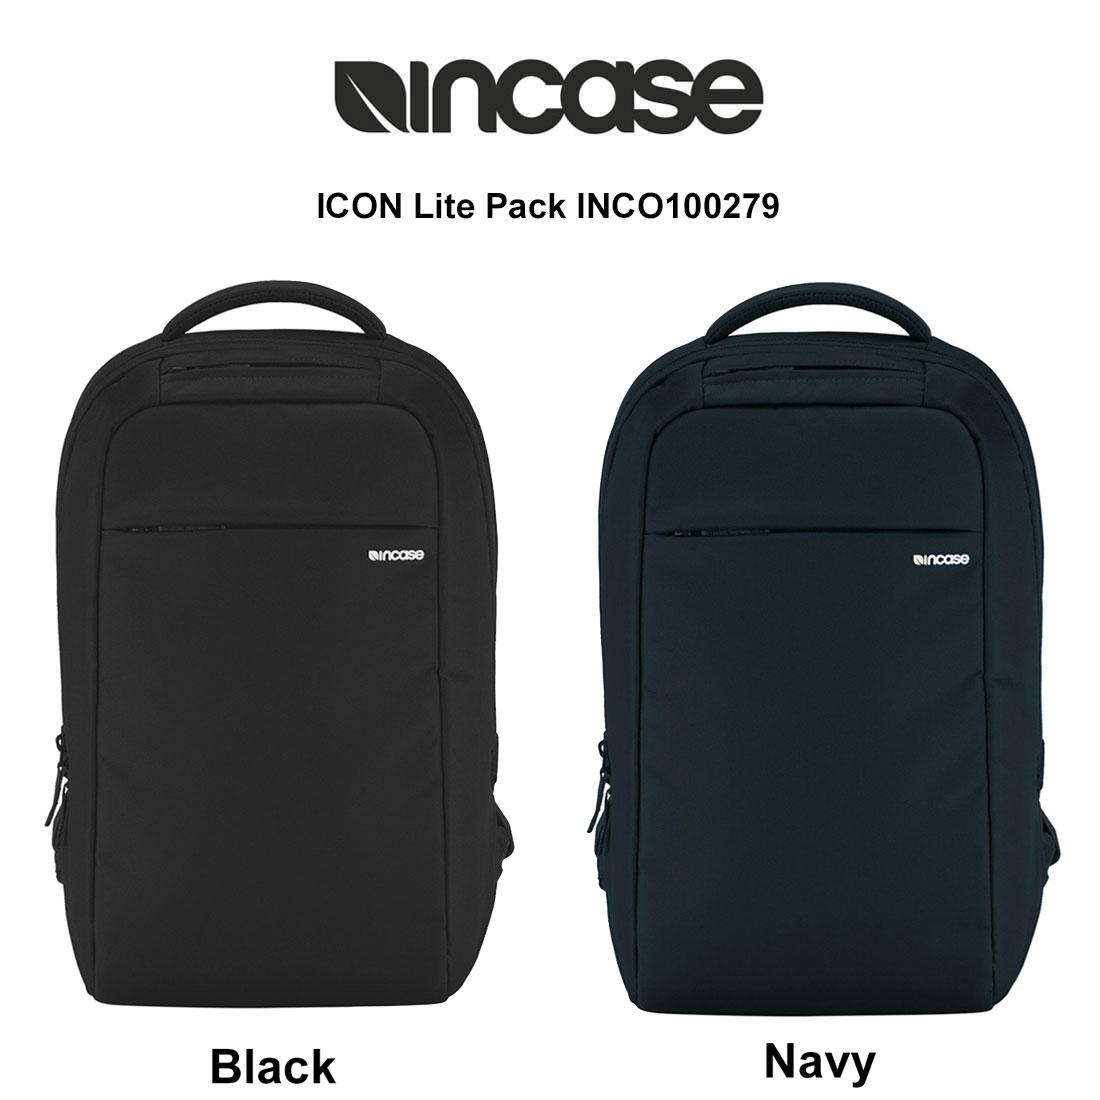 Incase(インケース)アイコン バックパック リュック 通勤通学 ICON Lite Pack INCO100279